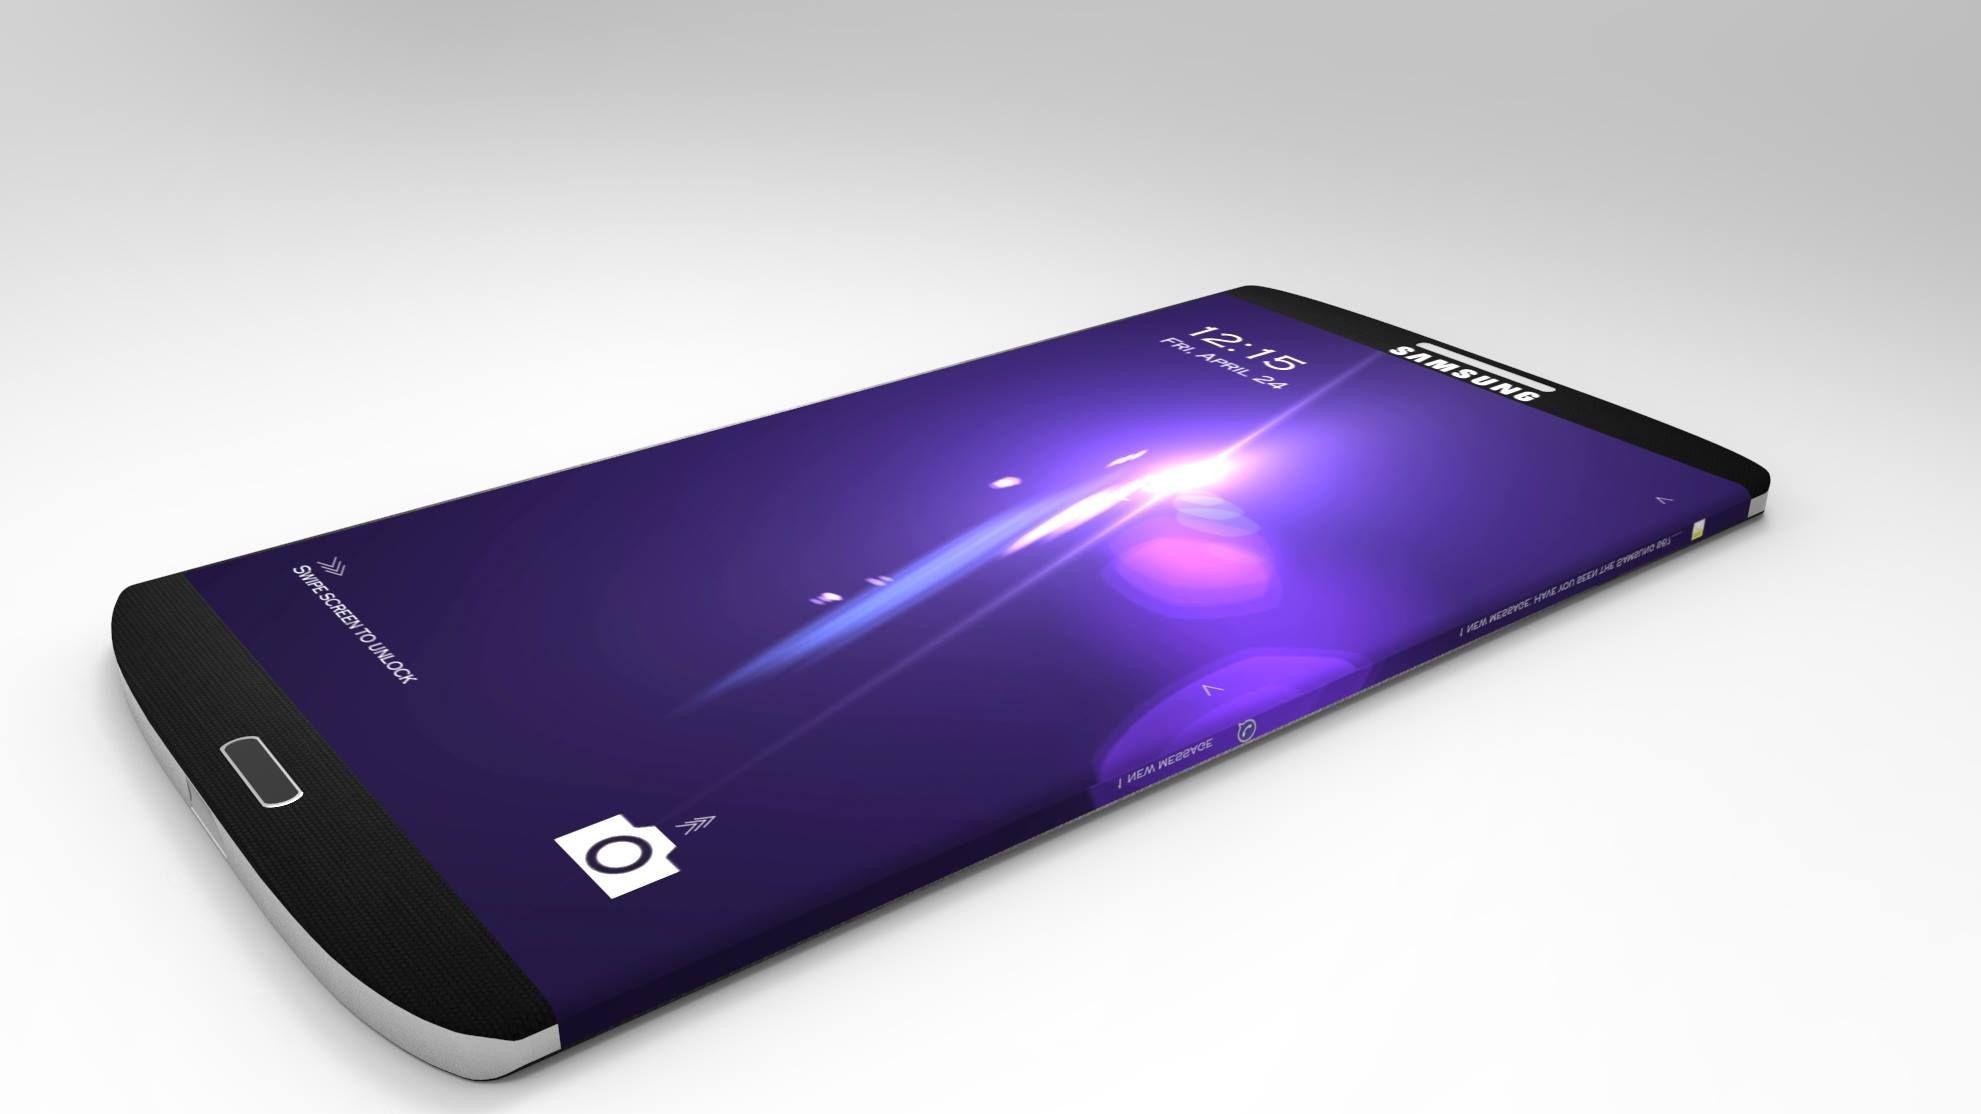 How To Get Rid Of Swipe Screen To Unlock Iphone